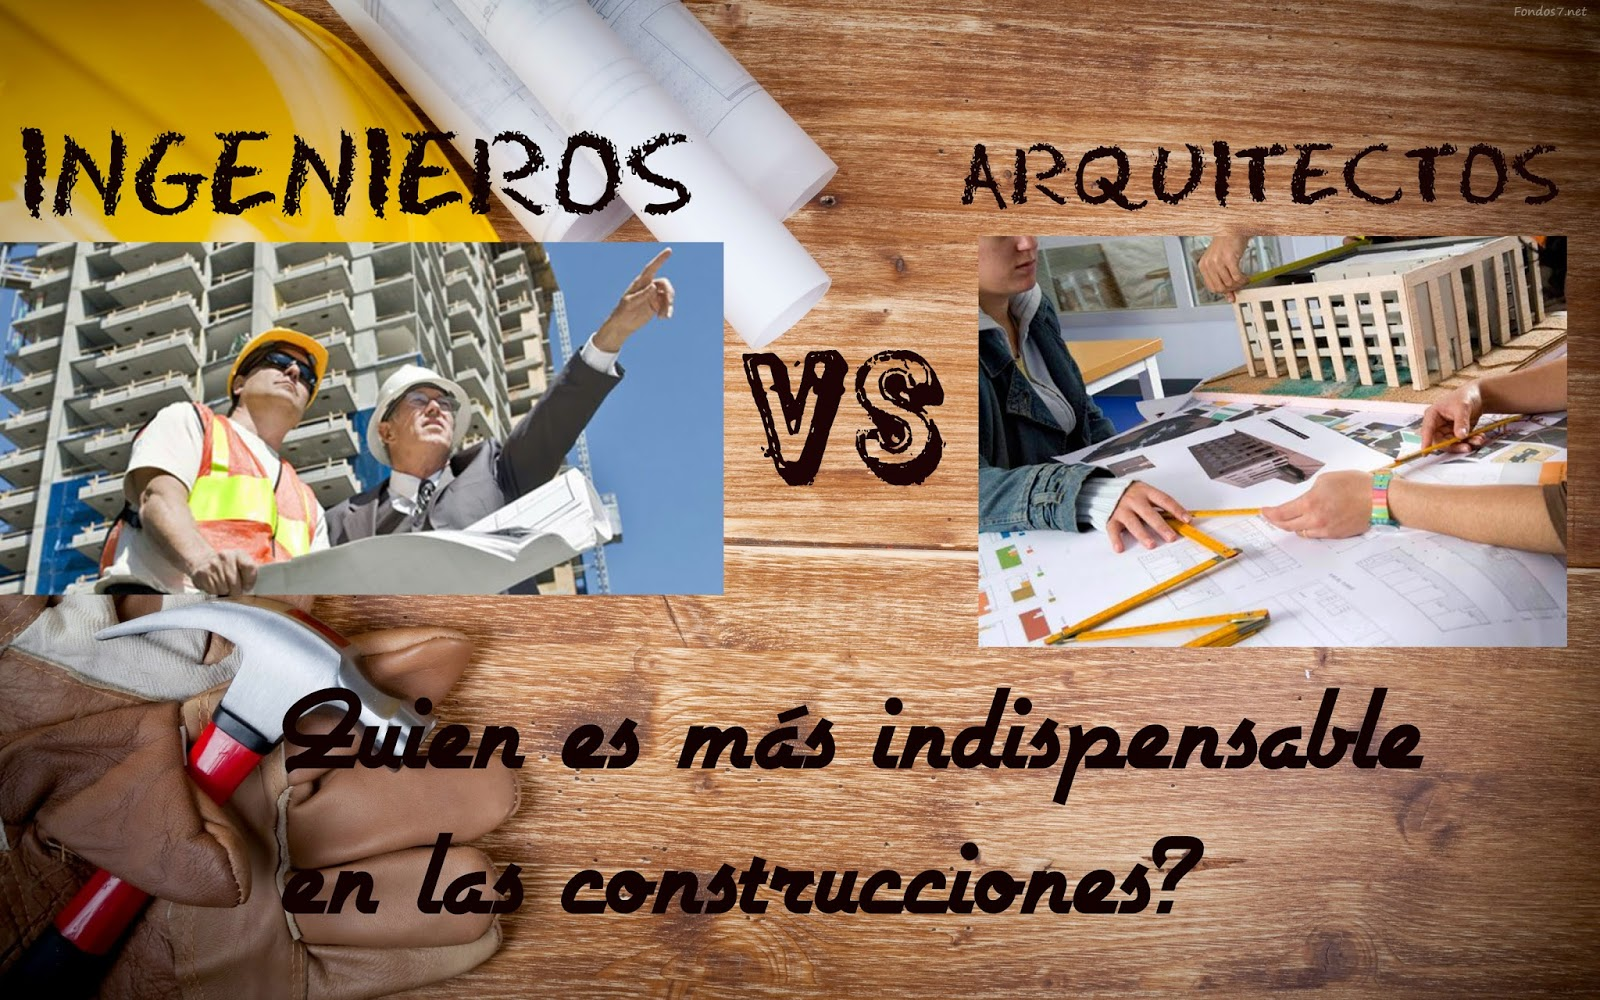 Ingeniero vs arquitectos maravillas de la ingenieria for Ingeniero arquitecto